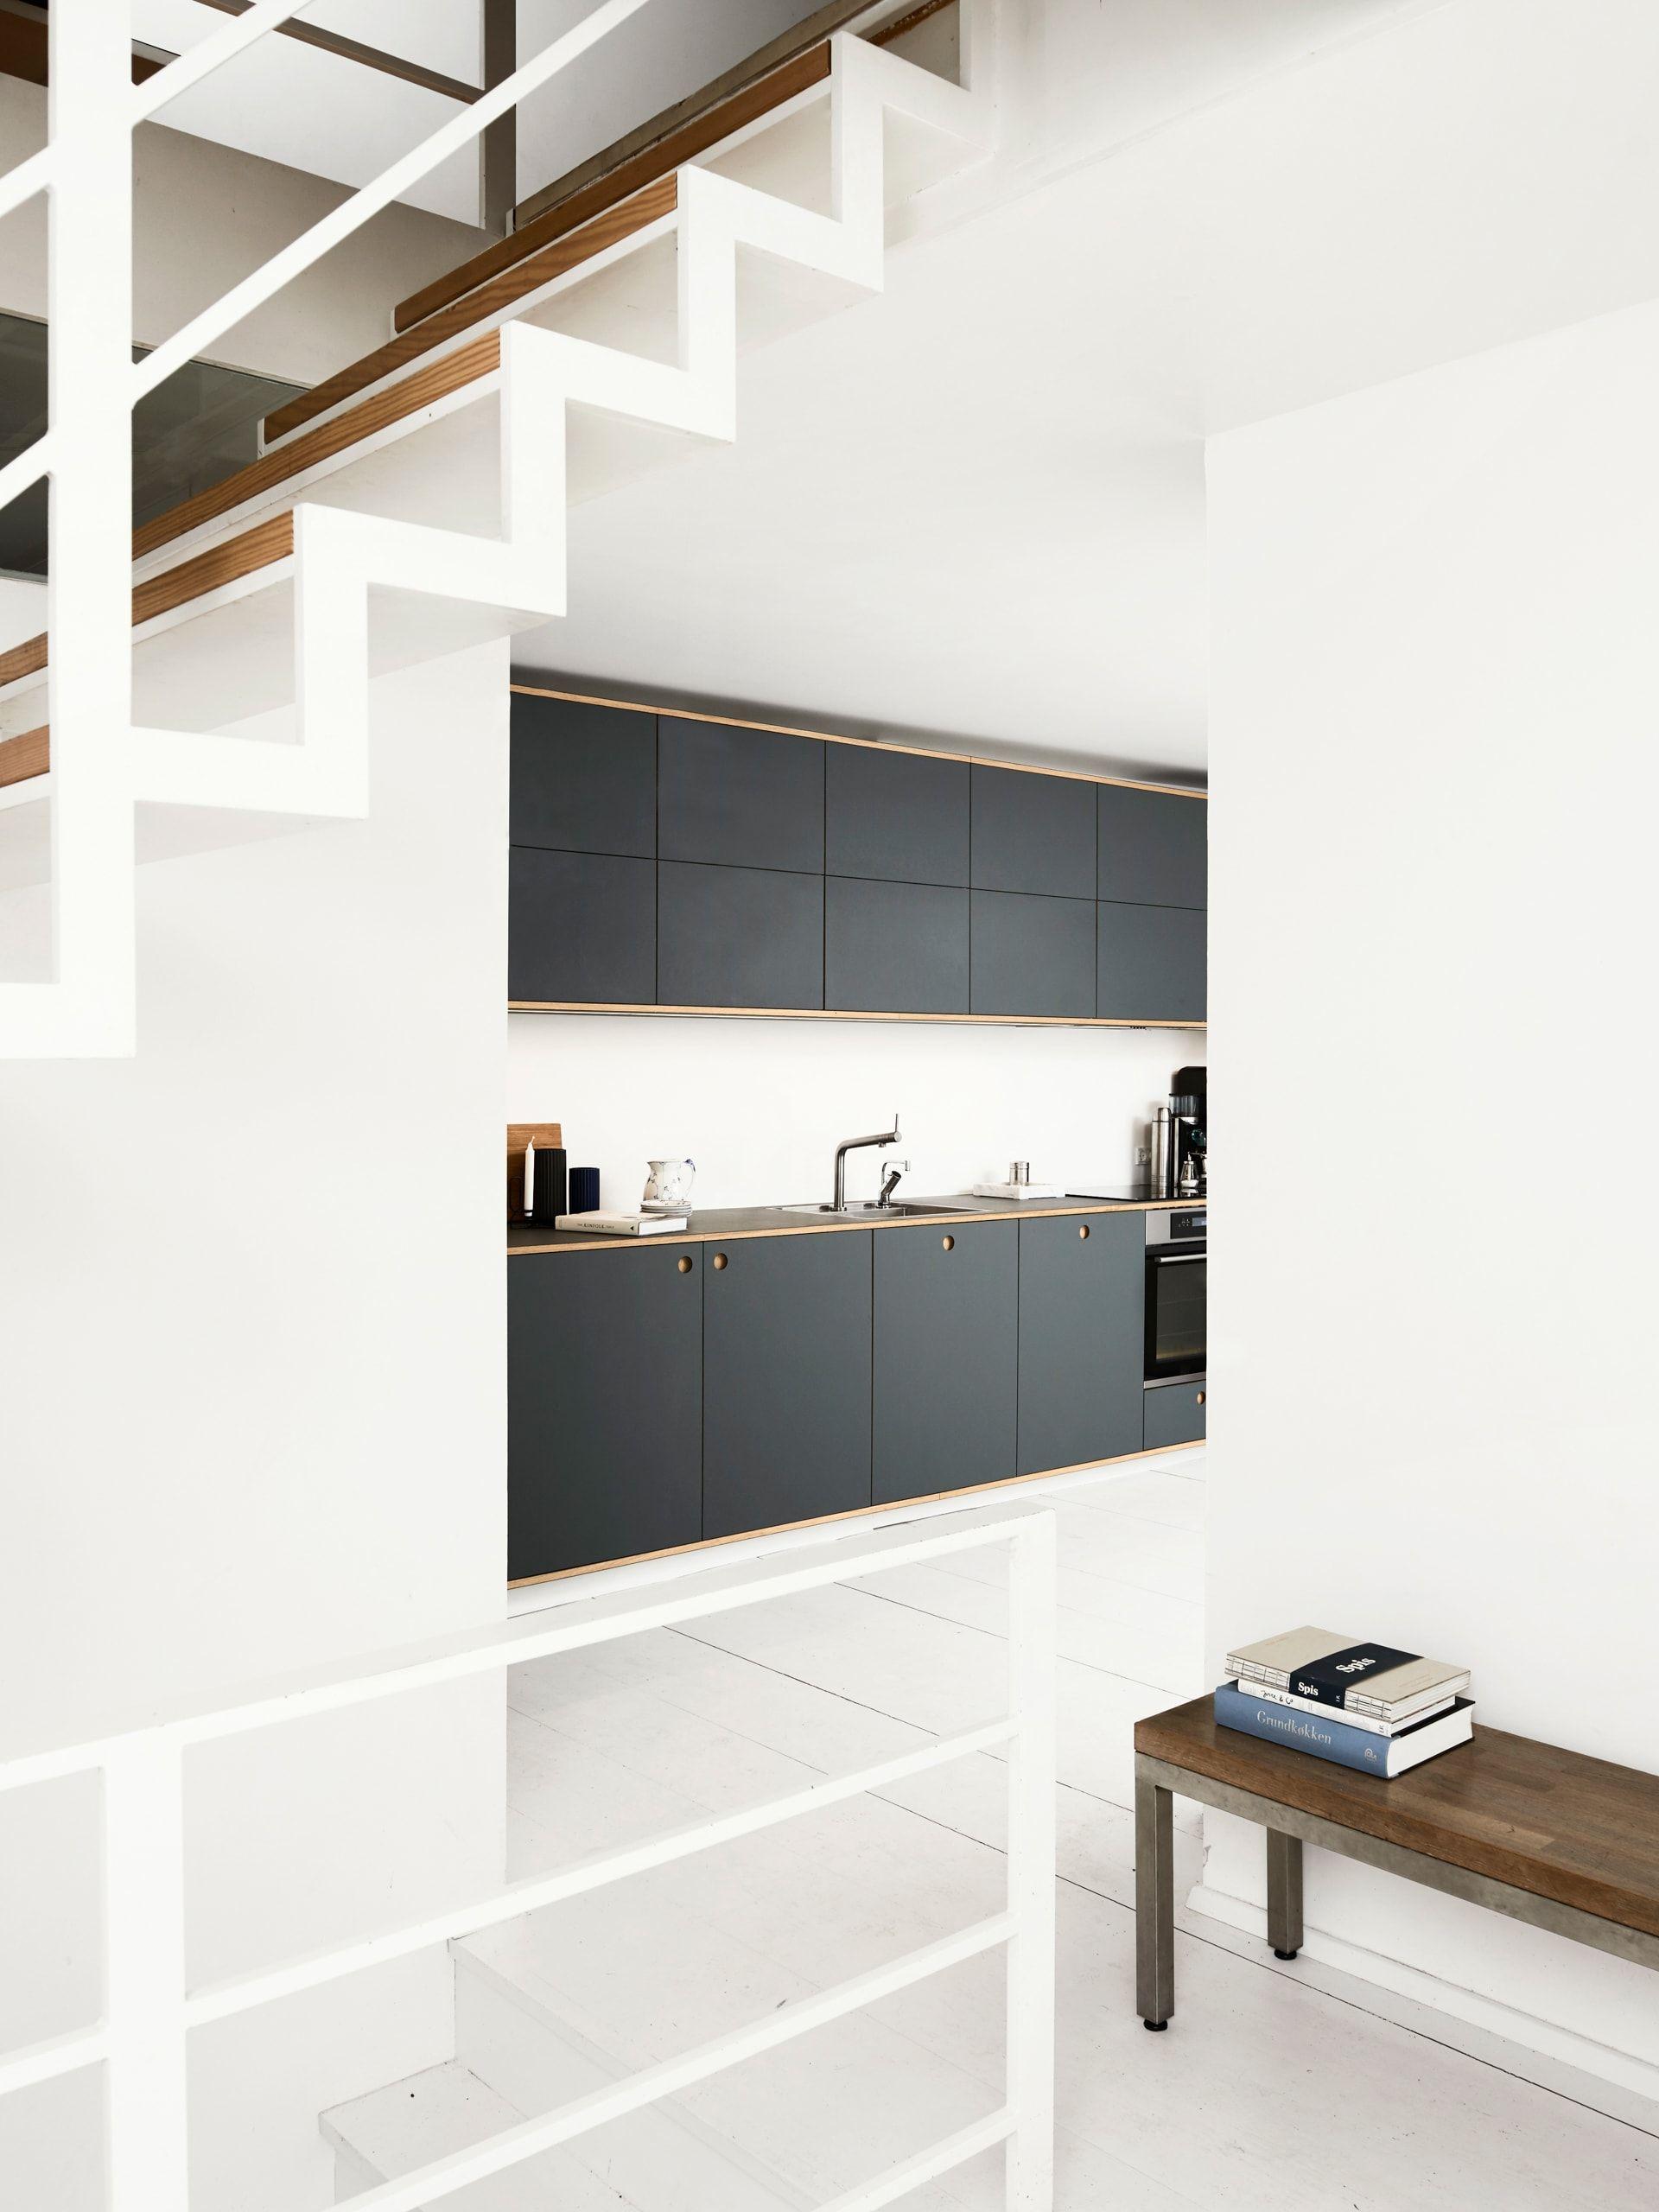 vesterfælledvej in vesterbro, denmark | kitchen designs, design